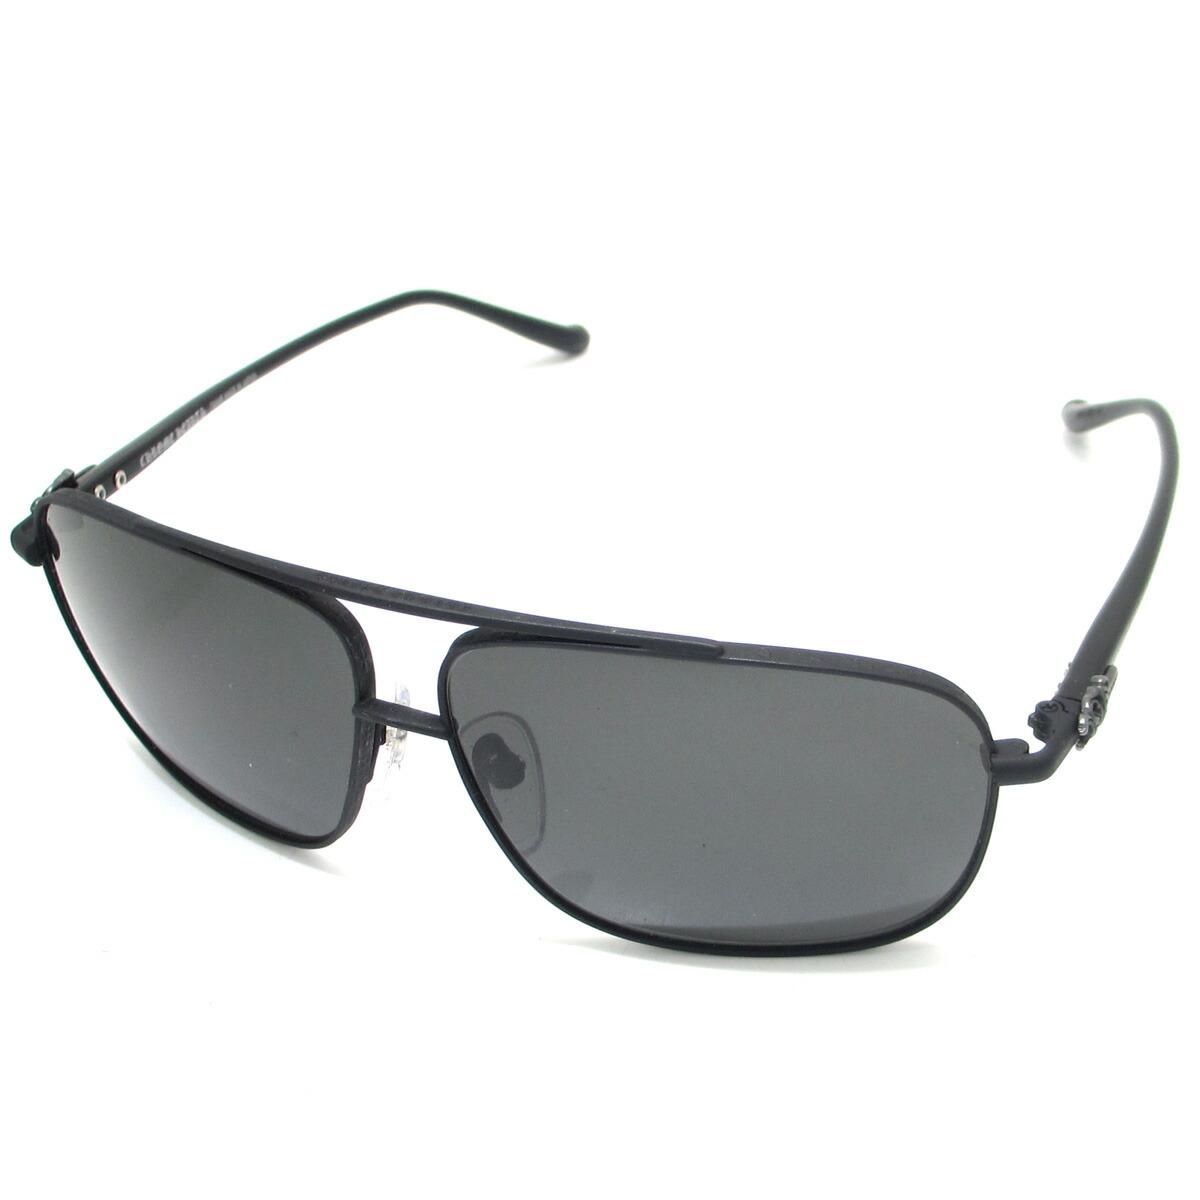 a8f45fbf846f Detalles acerca de Auth Chrome Hearts Black Lens Pork Sword Eyewear  Sunglasses Silver 925 (DH45272)